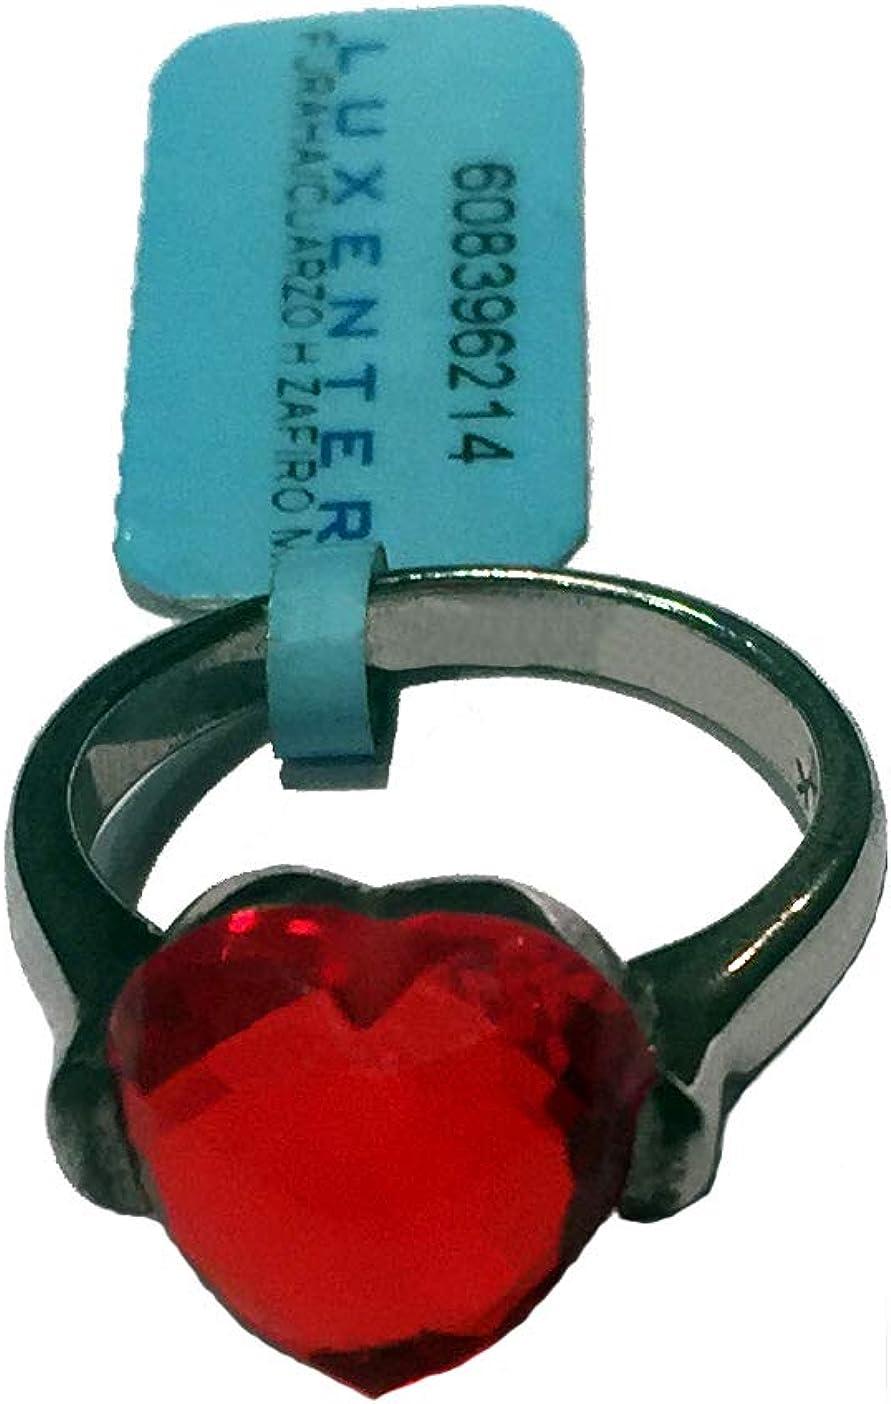 Anillo de Plata de Ley 608396214 con piedra roja en forma de corazón, calibre 14